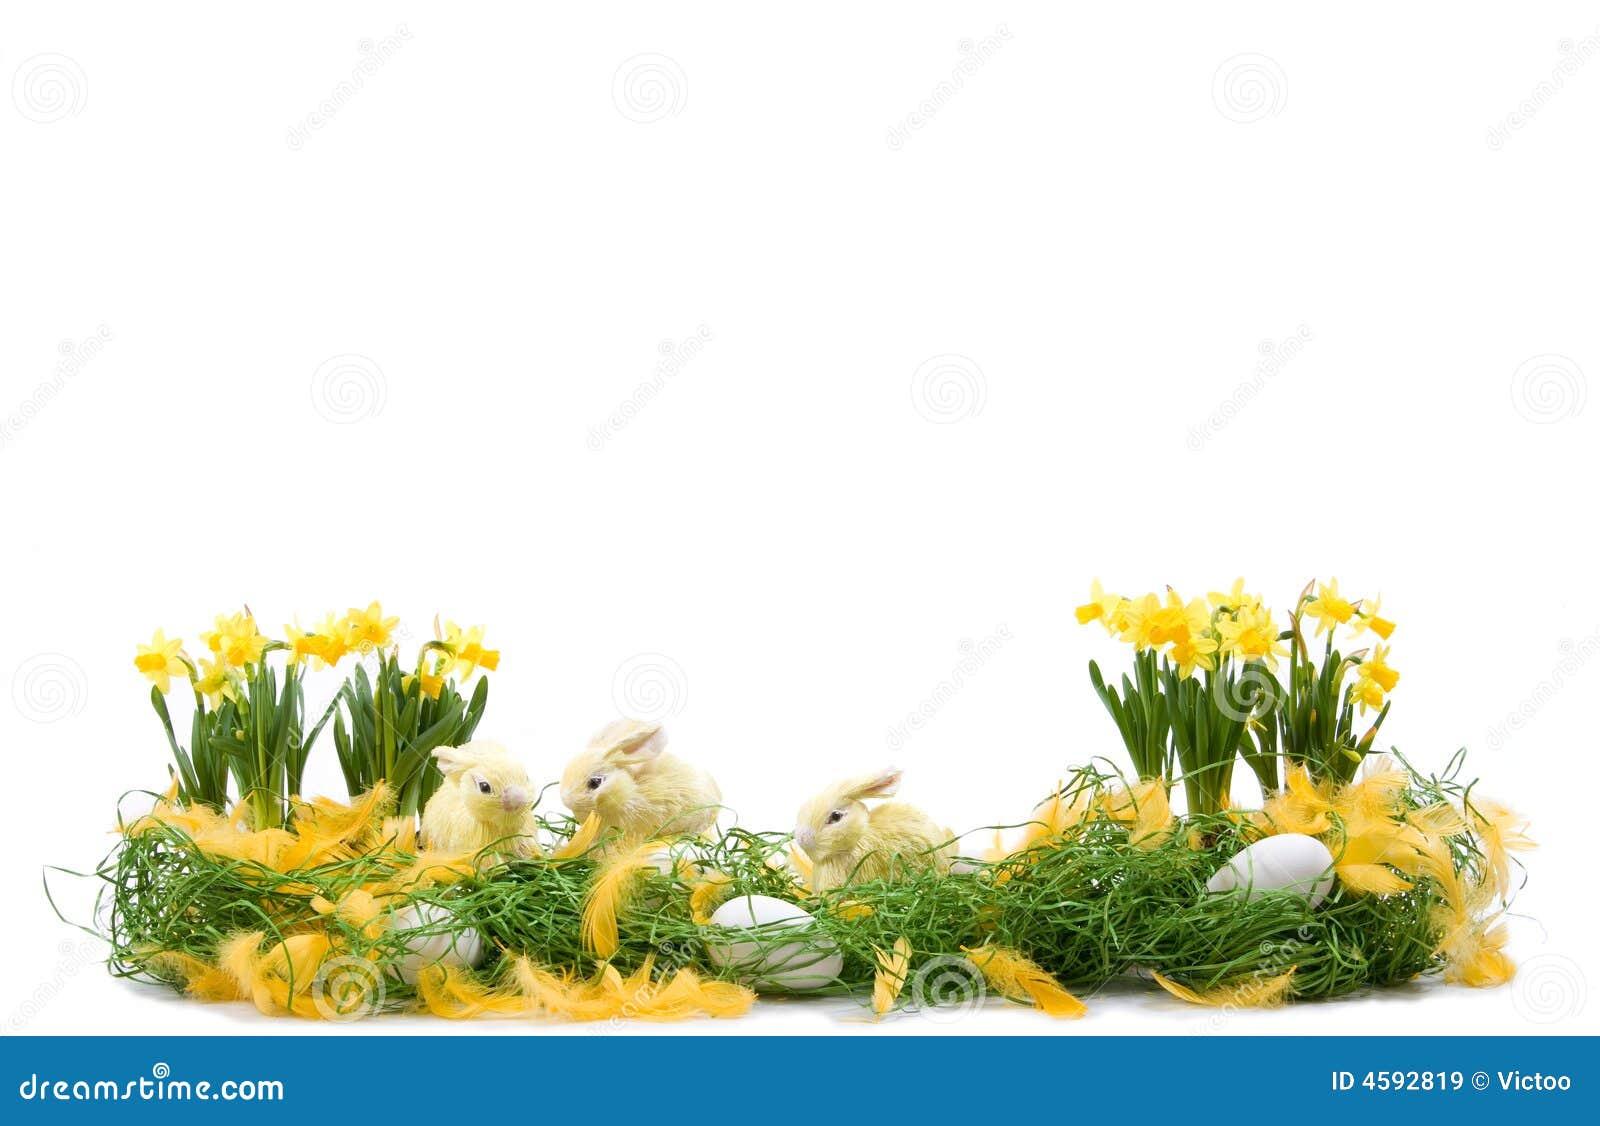 Ostern dekoration lizenzfreie stockbilder bild 4592819 for Dekoration ostern